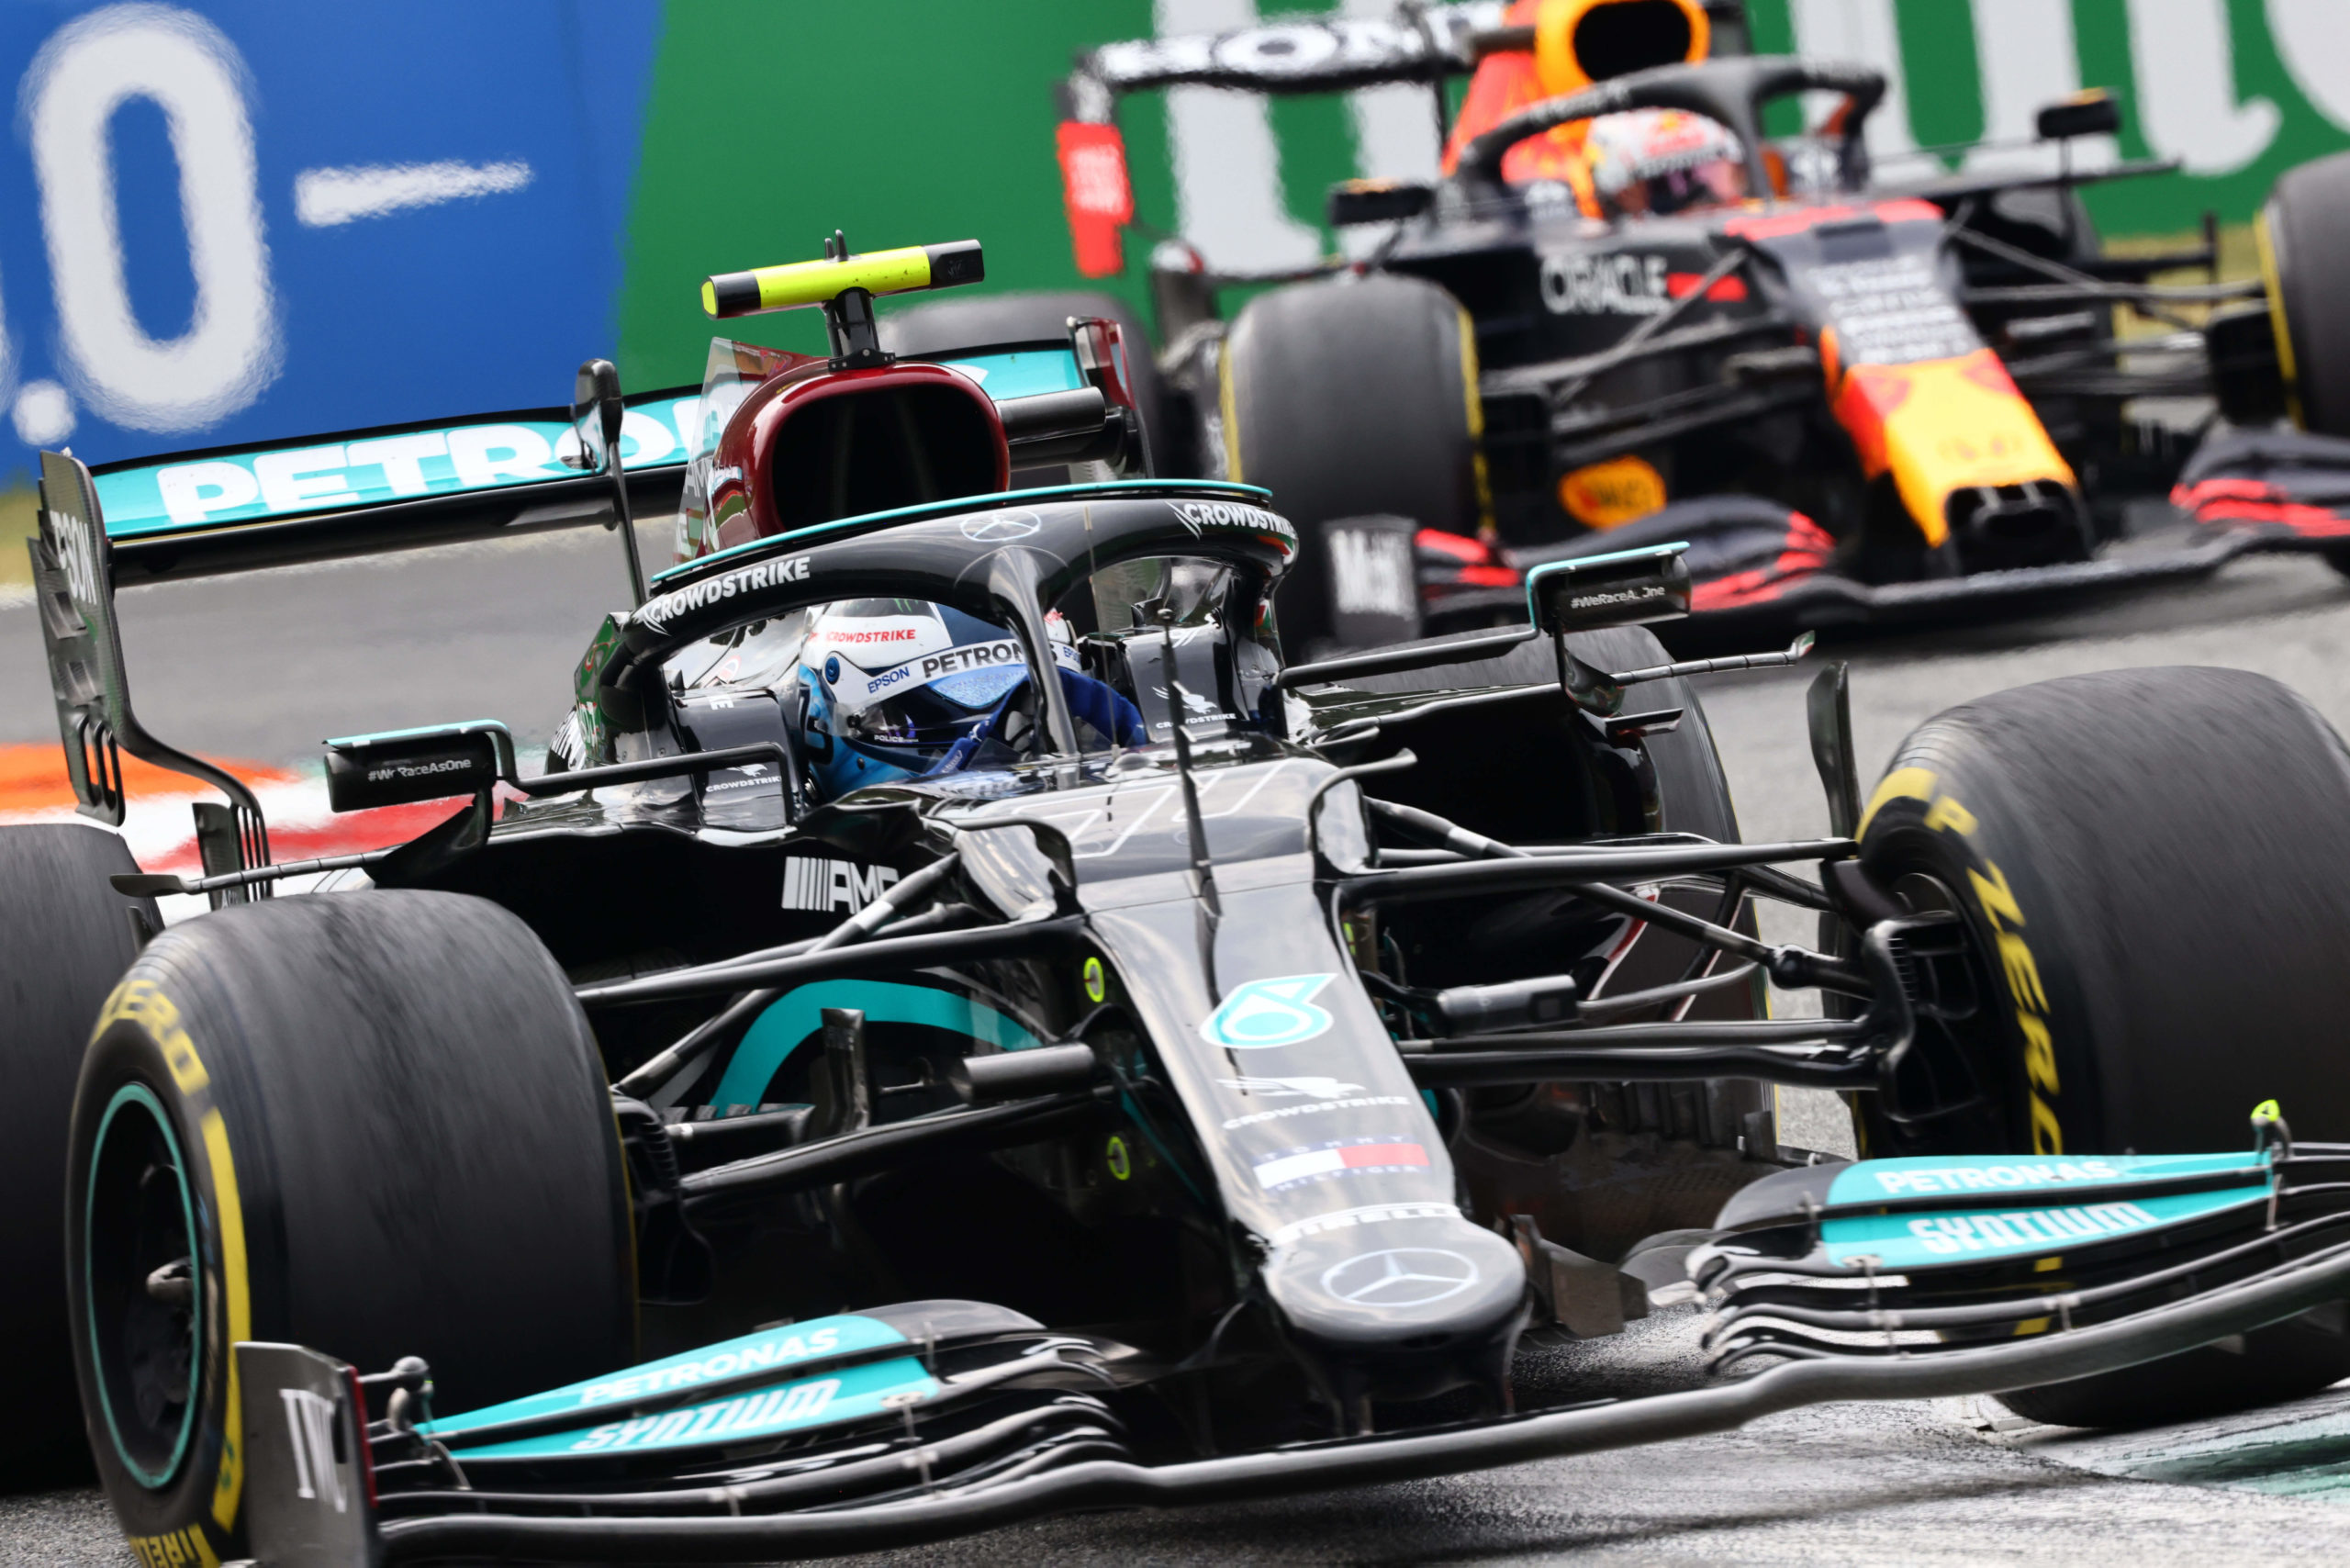 Valtteri Bottas, Mercedes, 2021 Italian Grand Prix, Friday - Steve Etherington